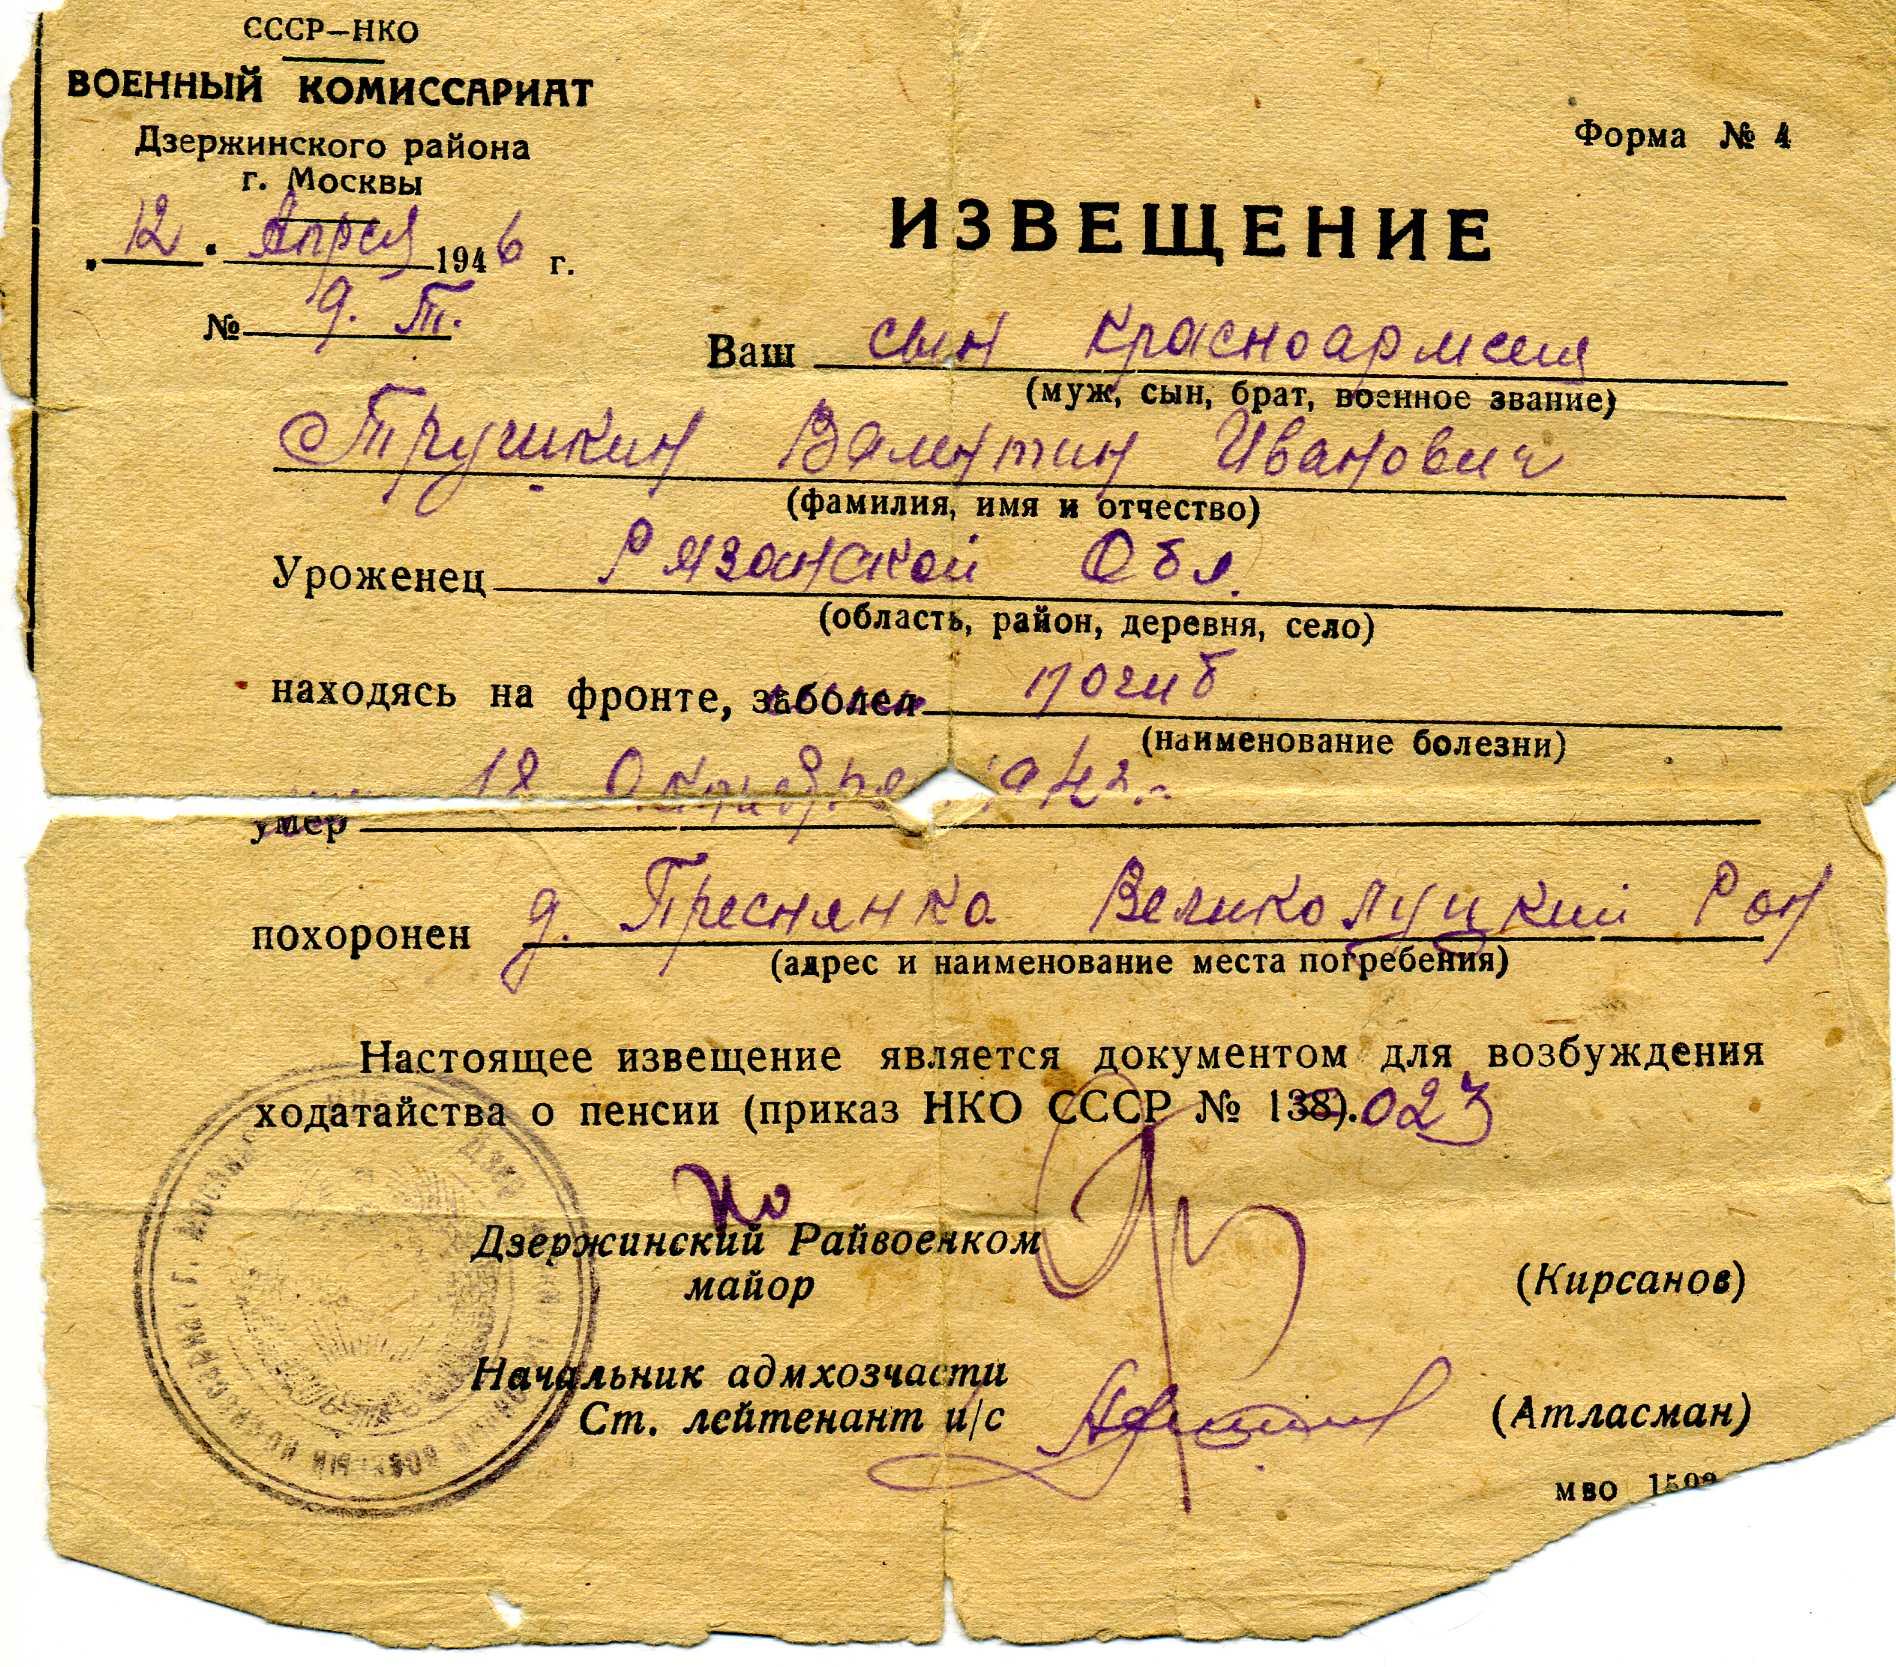 http://www.oldmikk.ru/img/memory/trushkin_valentin_ivan/pohoronka.jpg